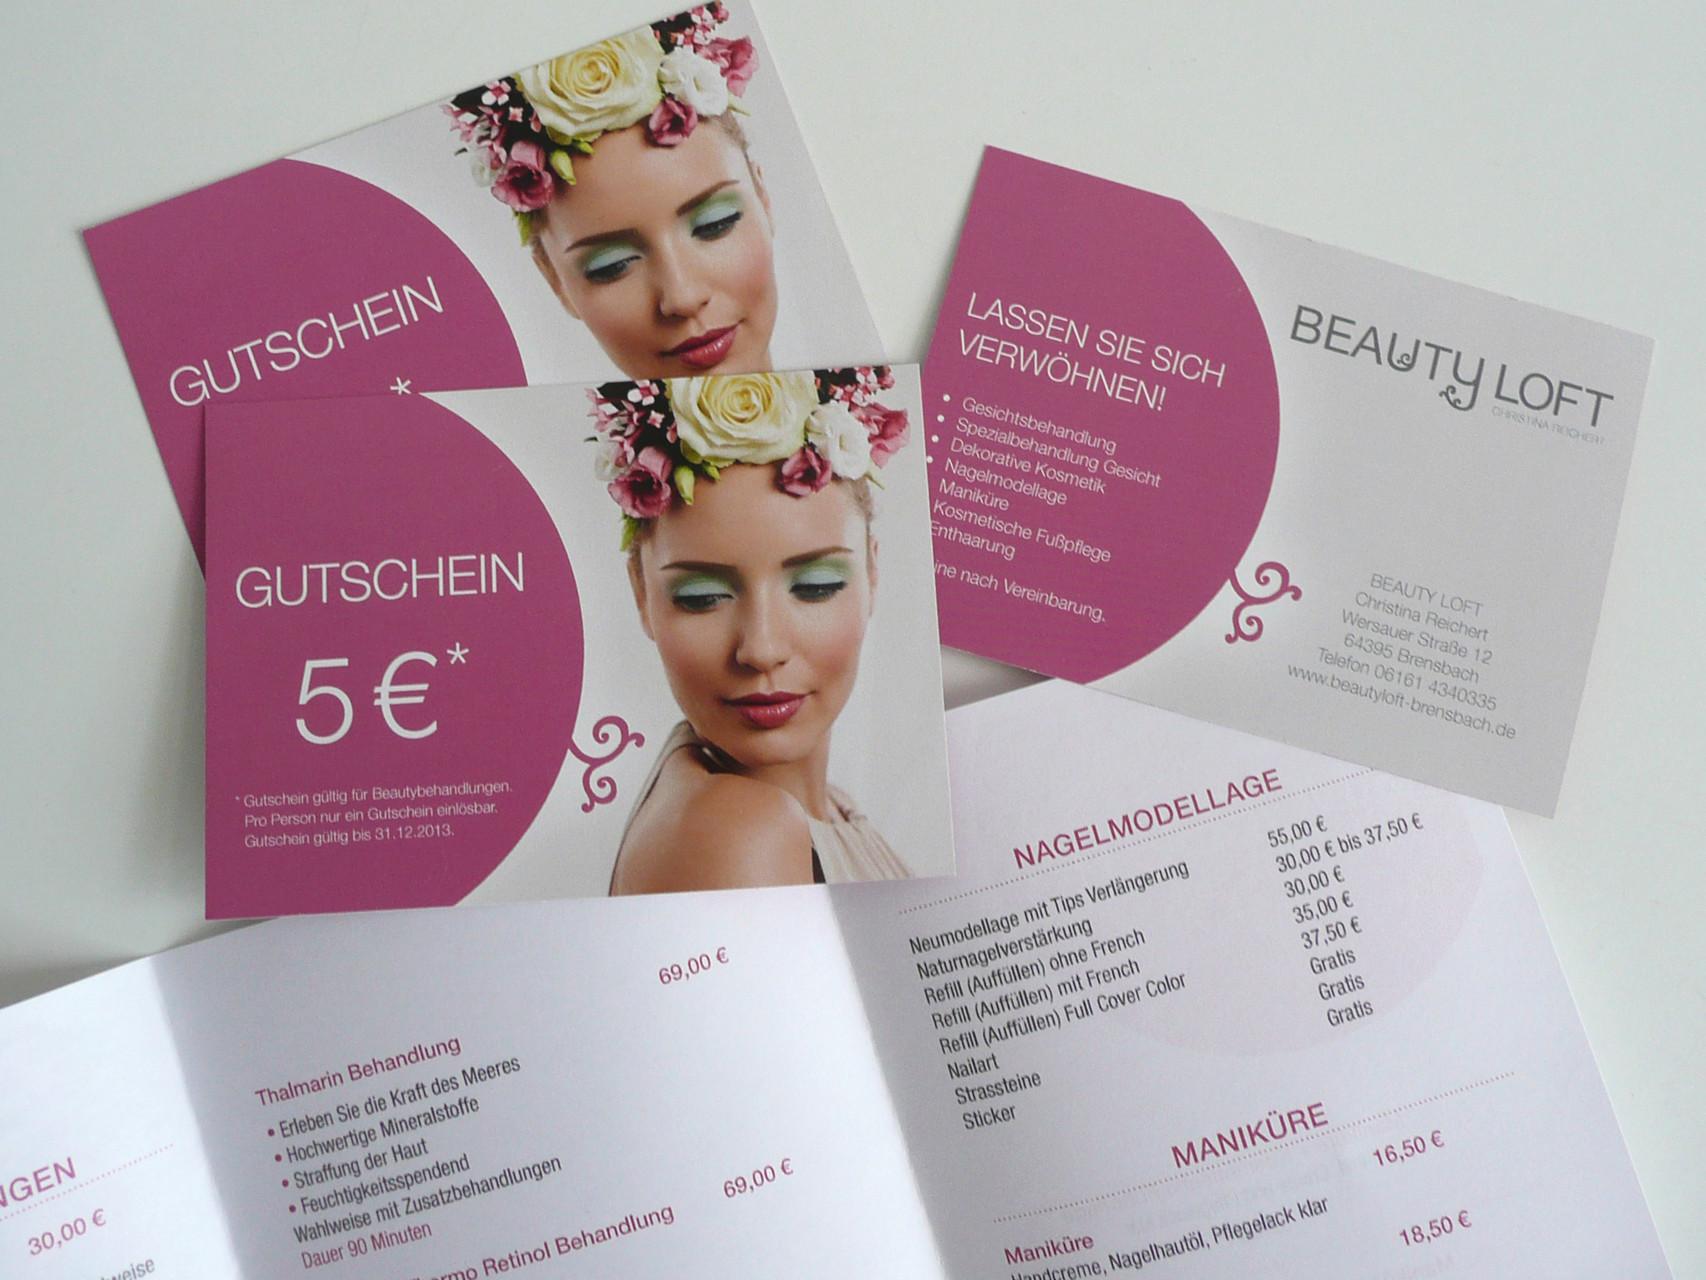 Corporate Design, Logoentwicklung, Logo, Grafikdesign, Grafik, Gestaltung, Beautyloft Gutscheine